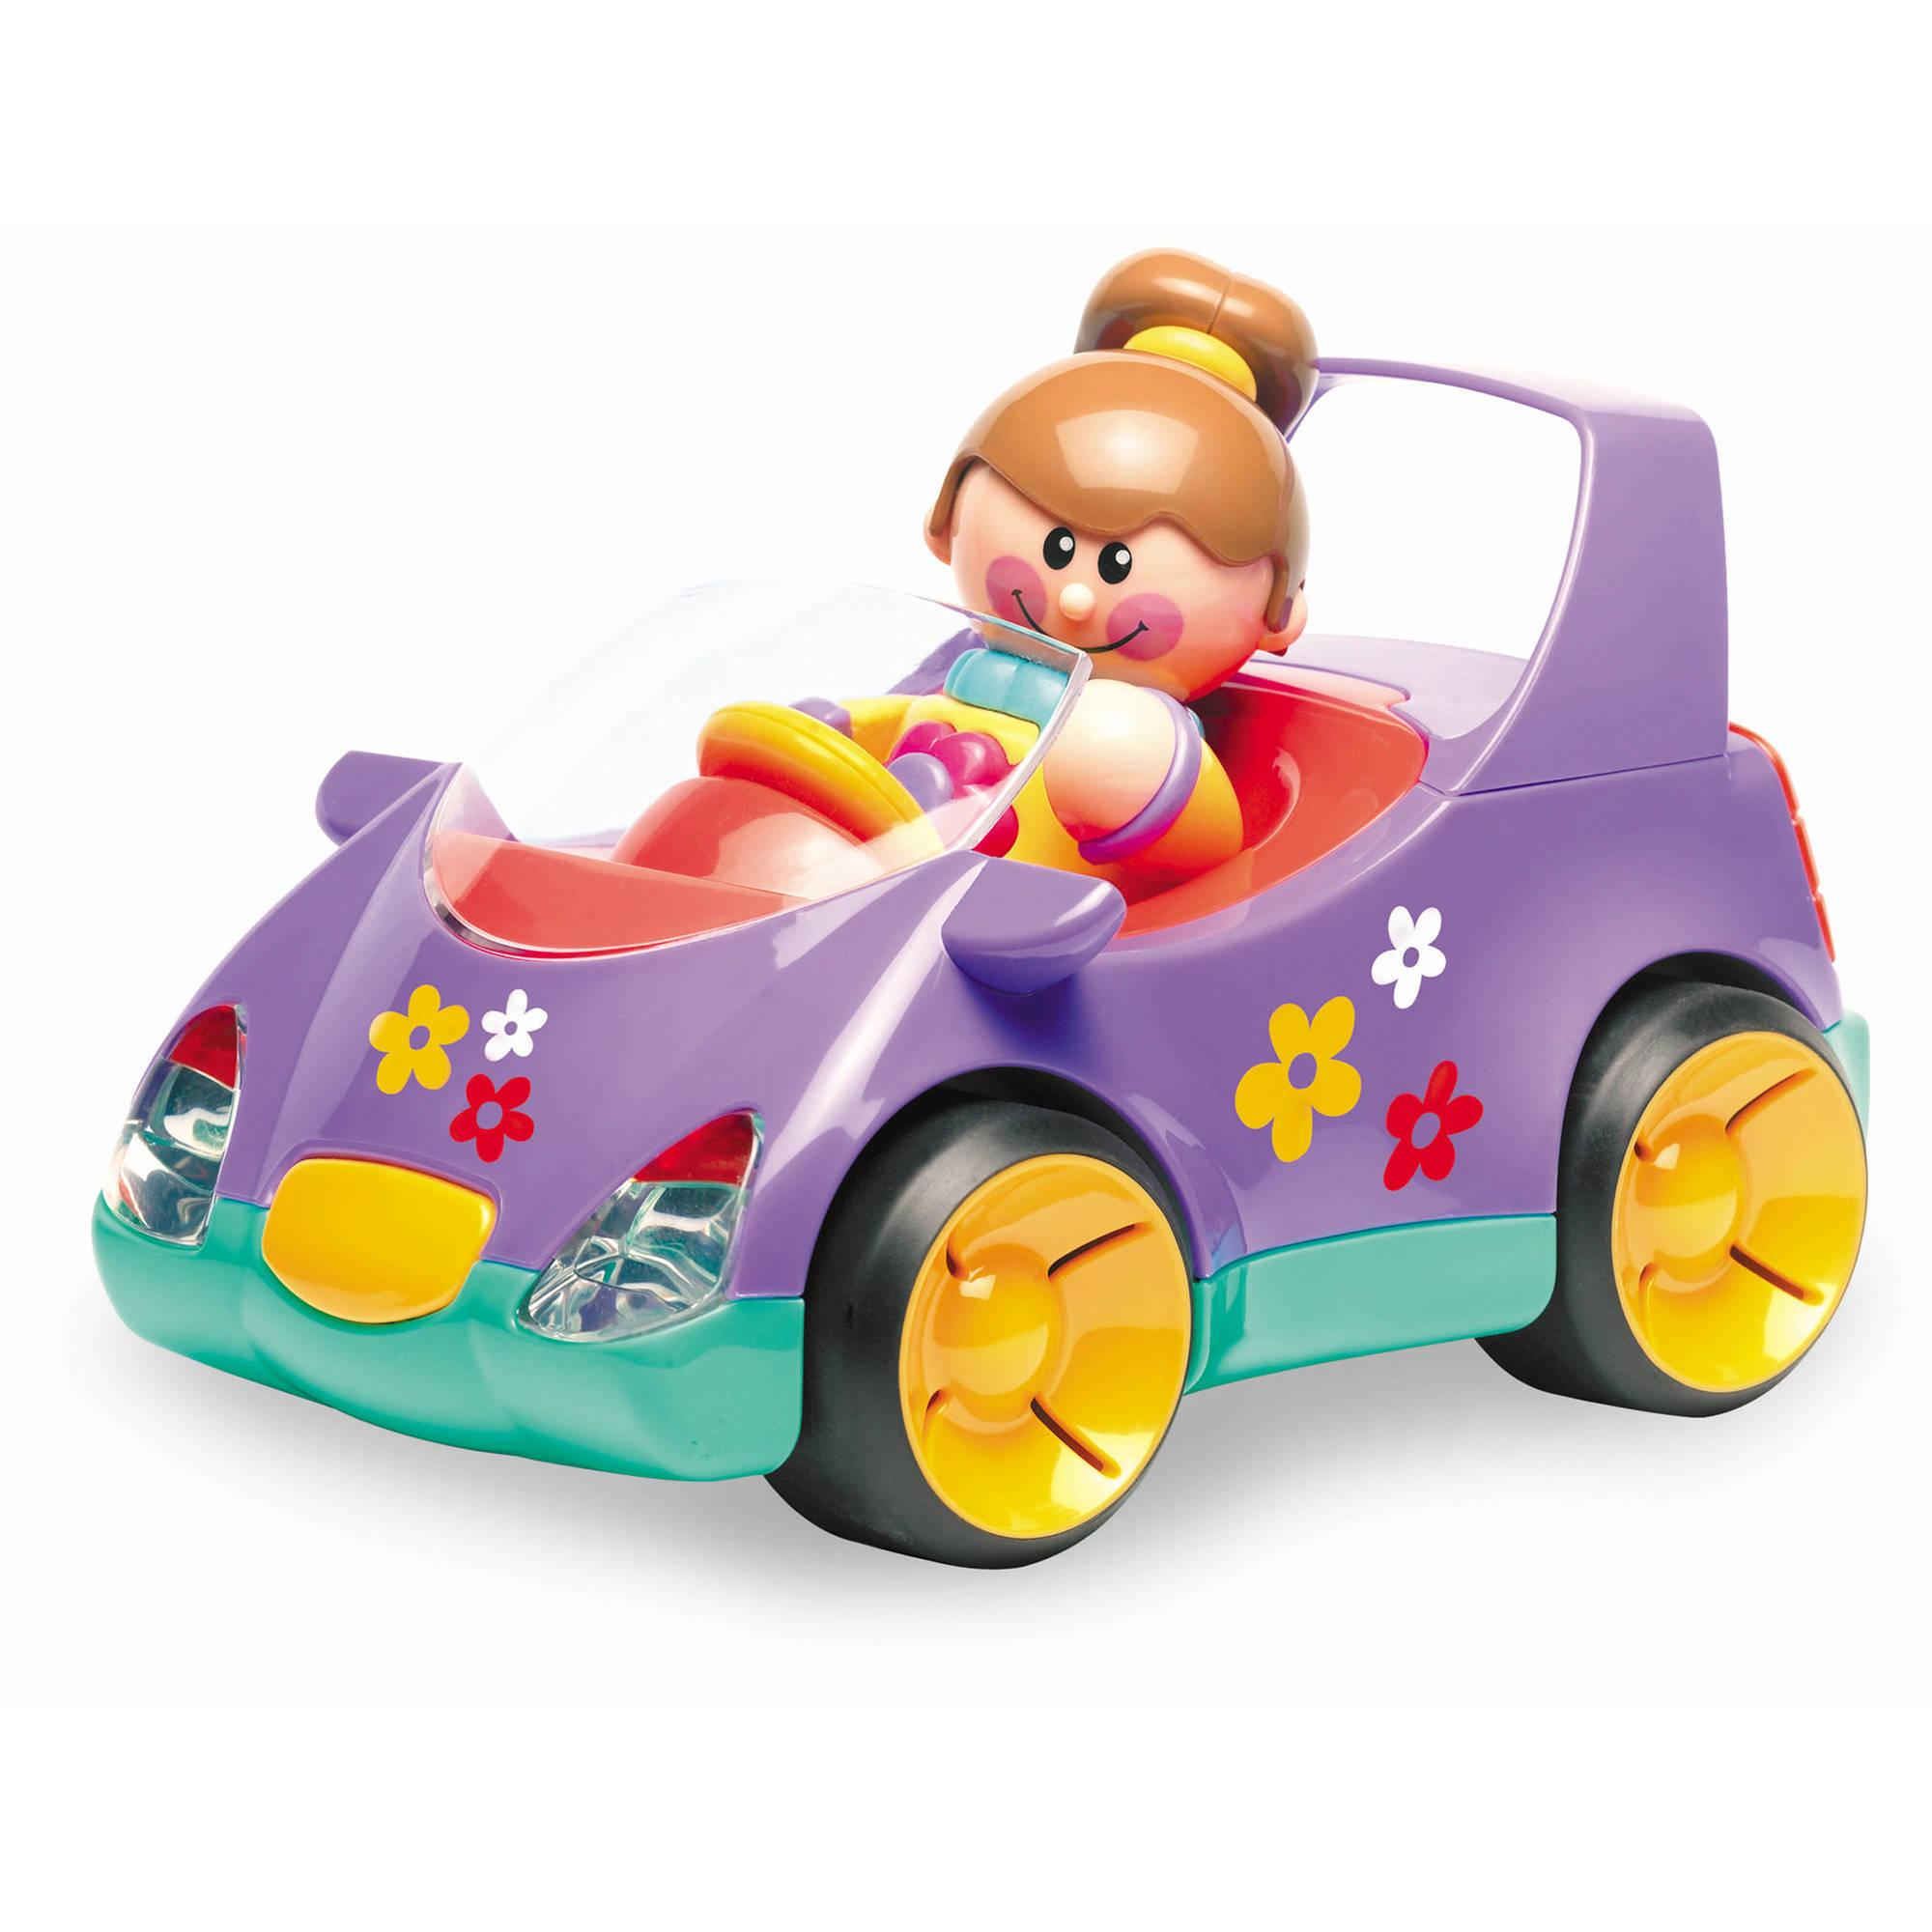 Tolo First Friends Car, Pastel Colors